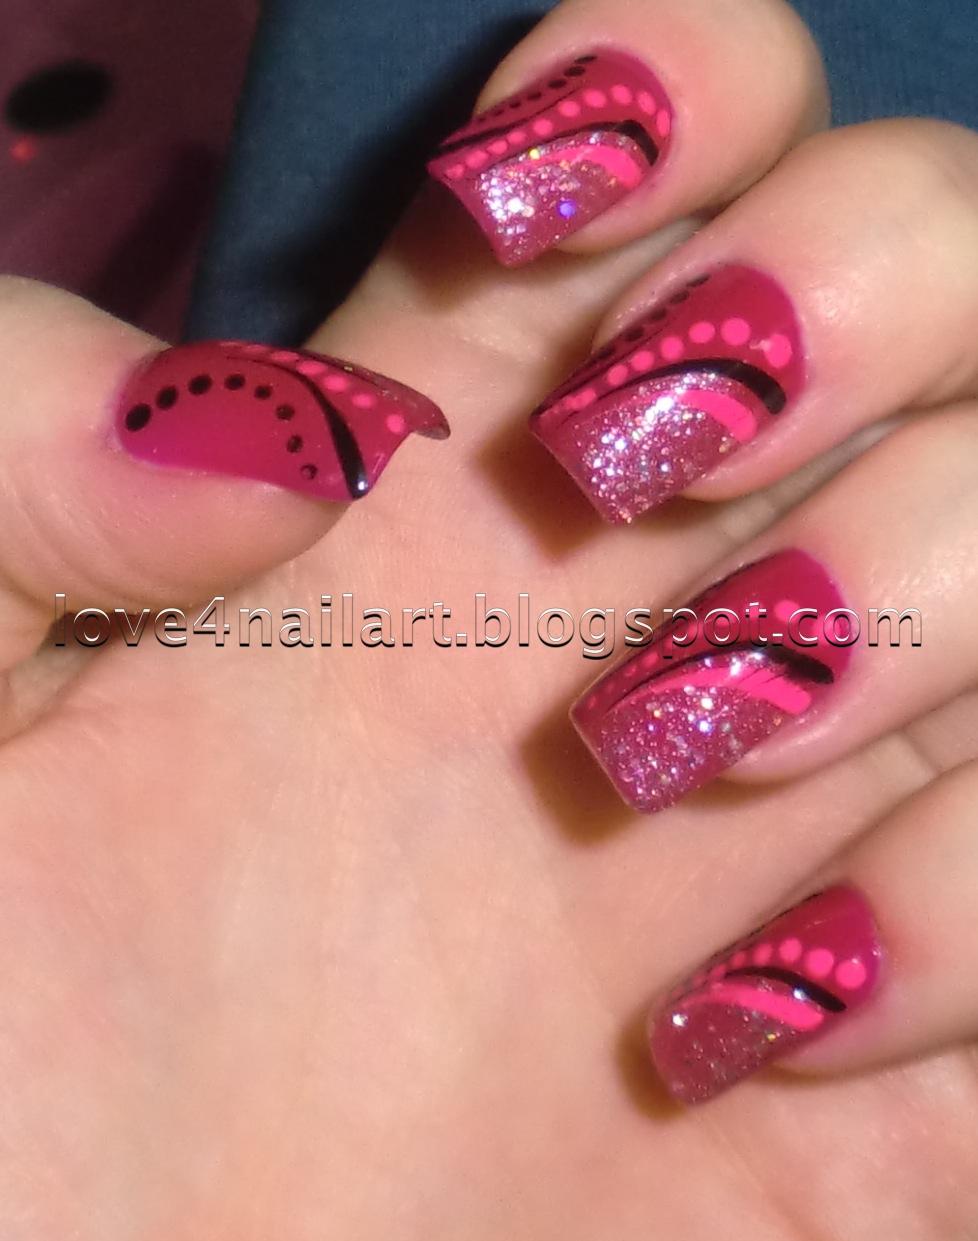 Simple Line Nail Art : Love nailart simple nail art